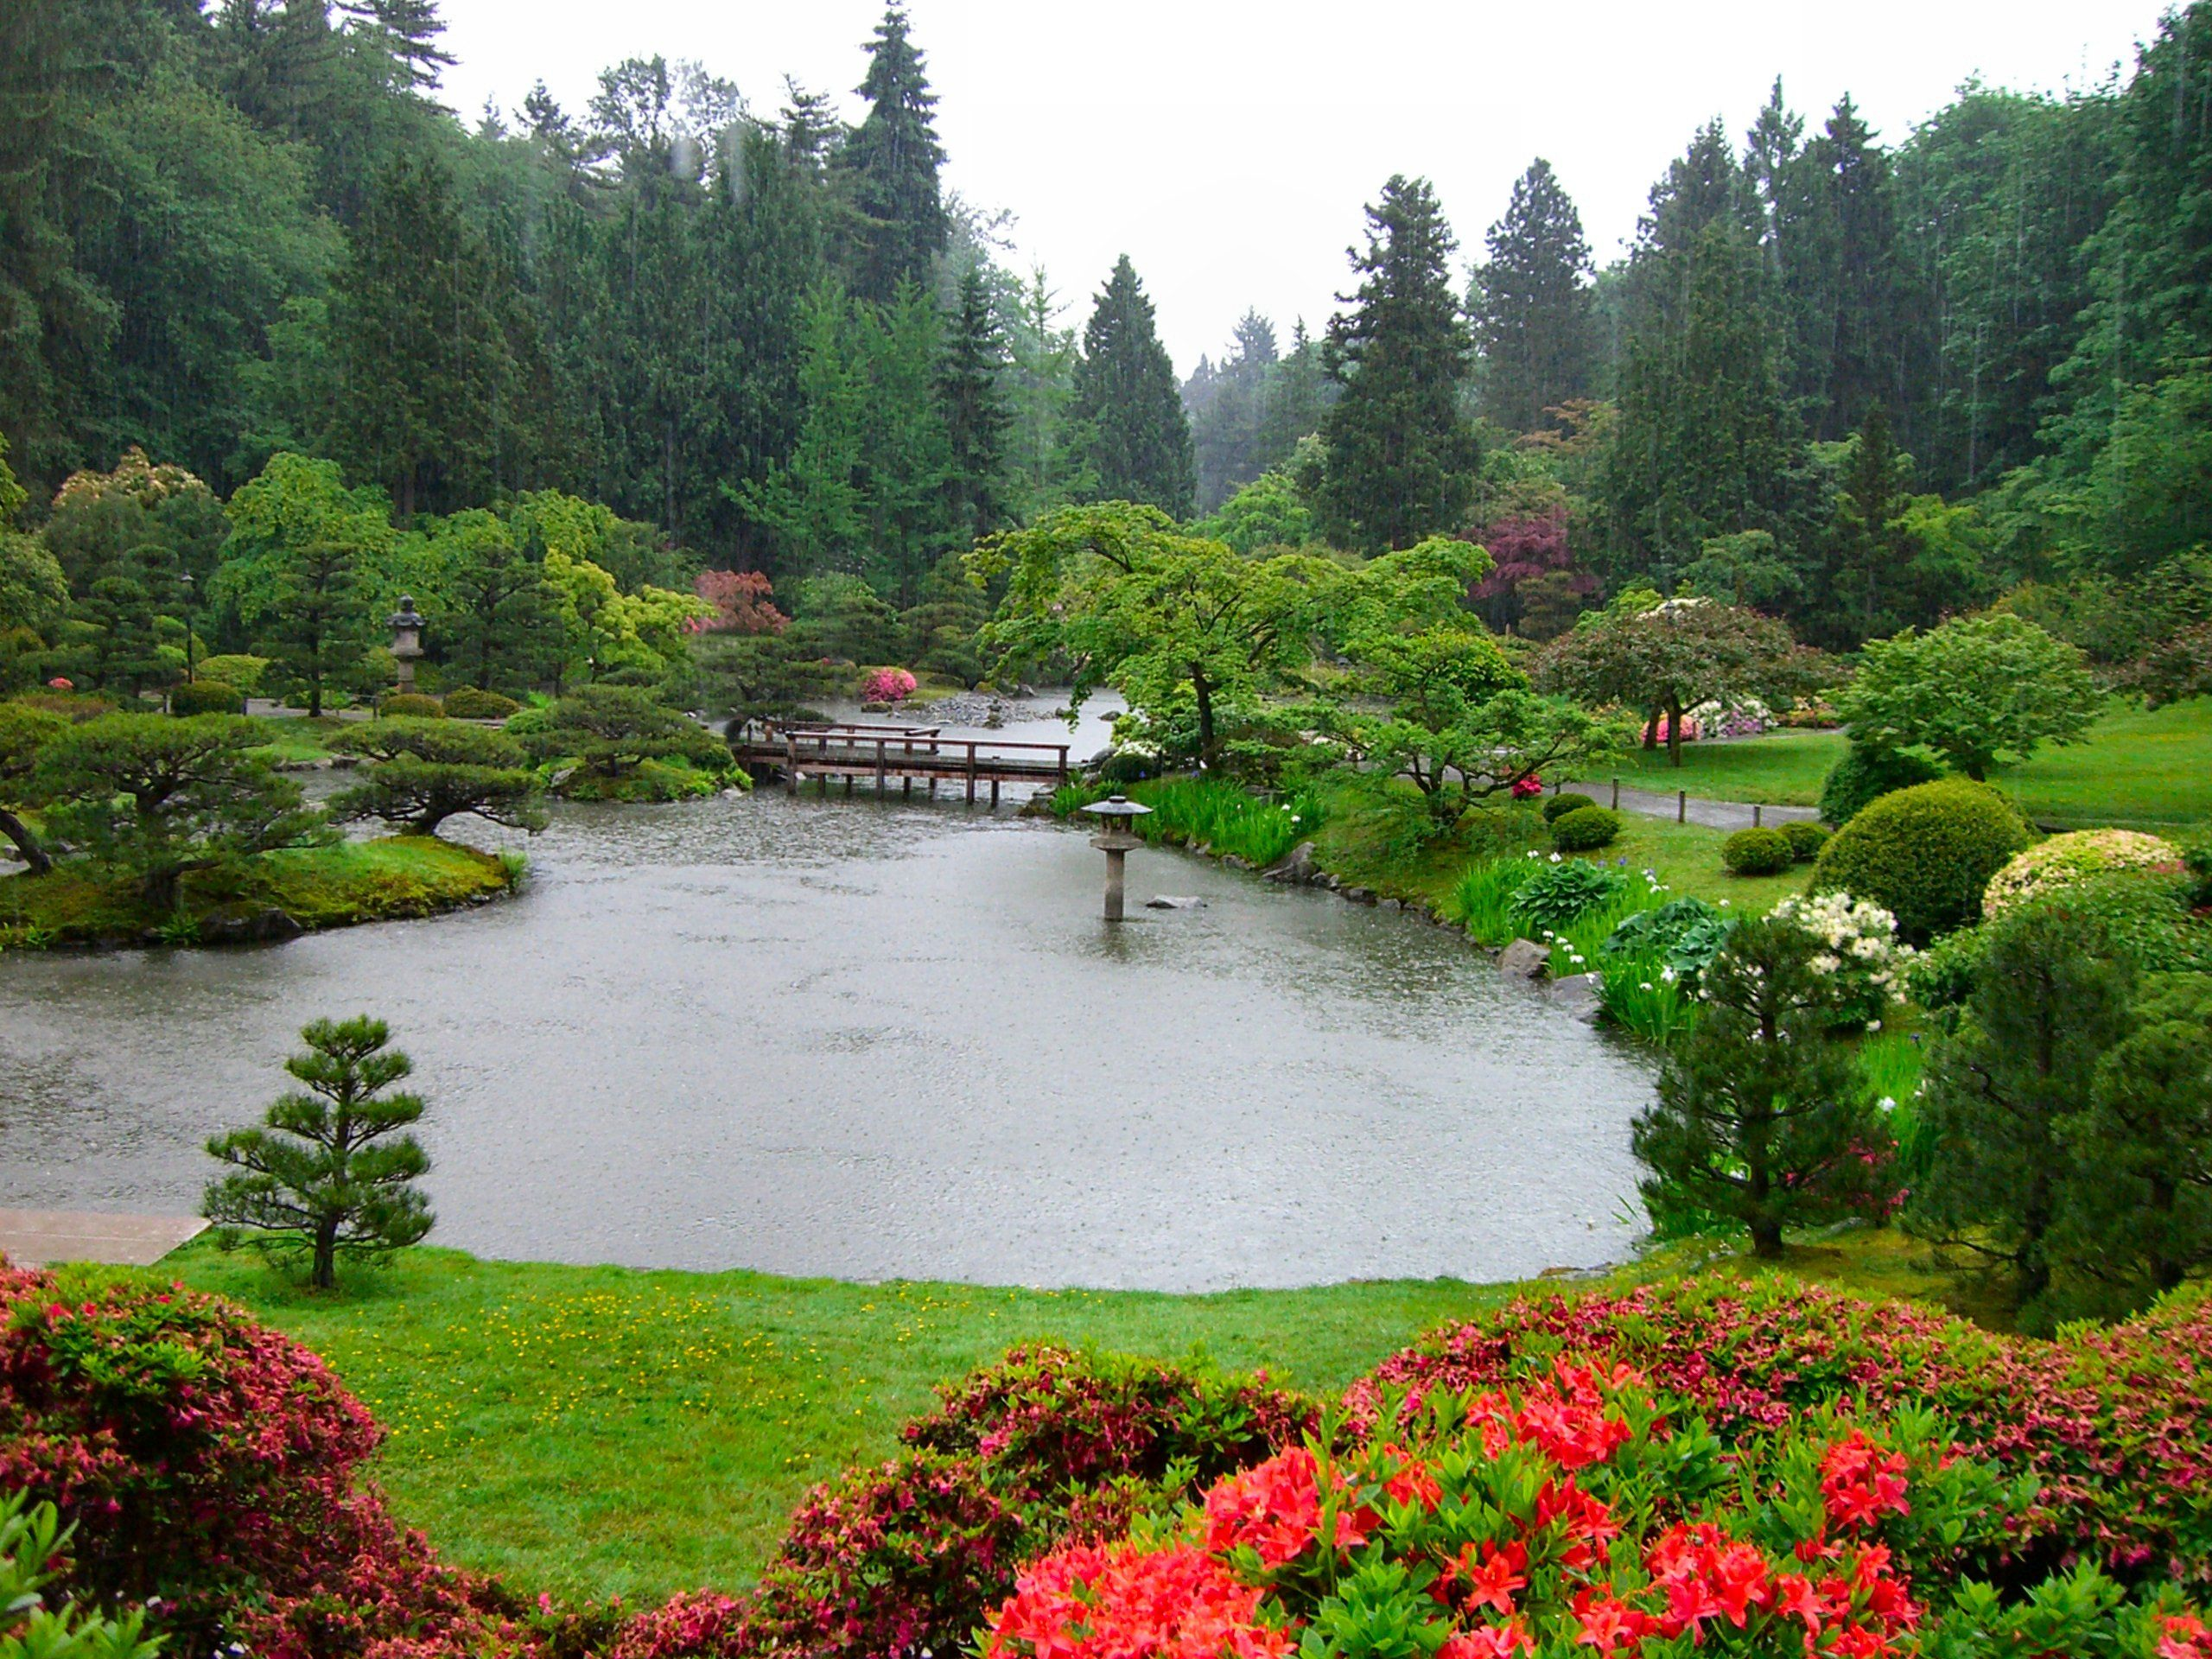 The Seattle Japanese Garden Is A Acre M²) Japanese Garden In Seattle,  Washington, Located In The Southwest Corner Of The Washington Park  Arboretum Along ...